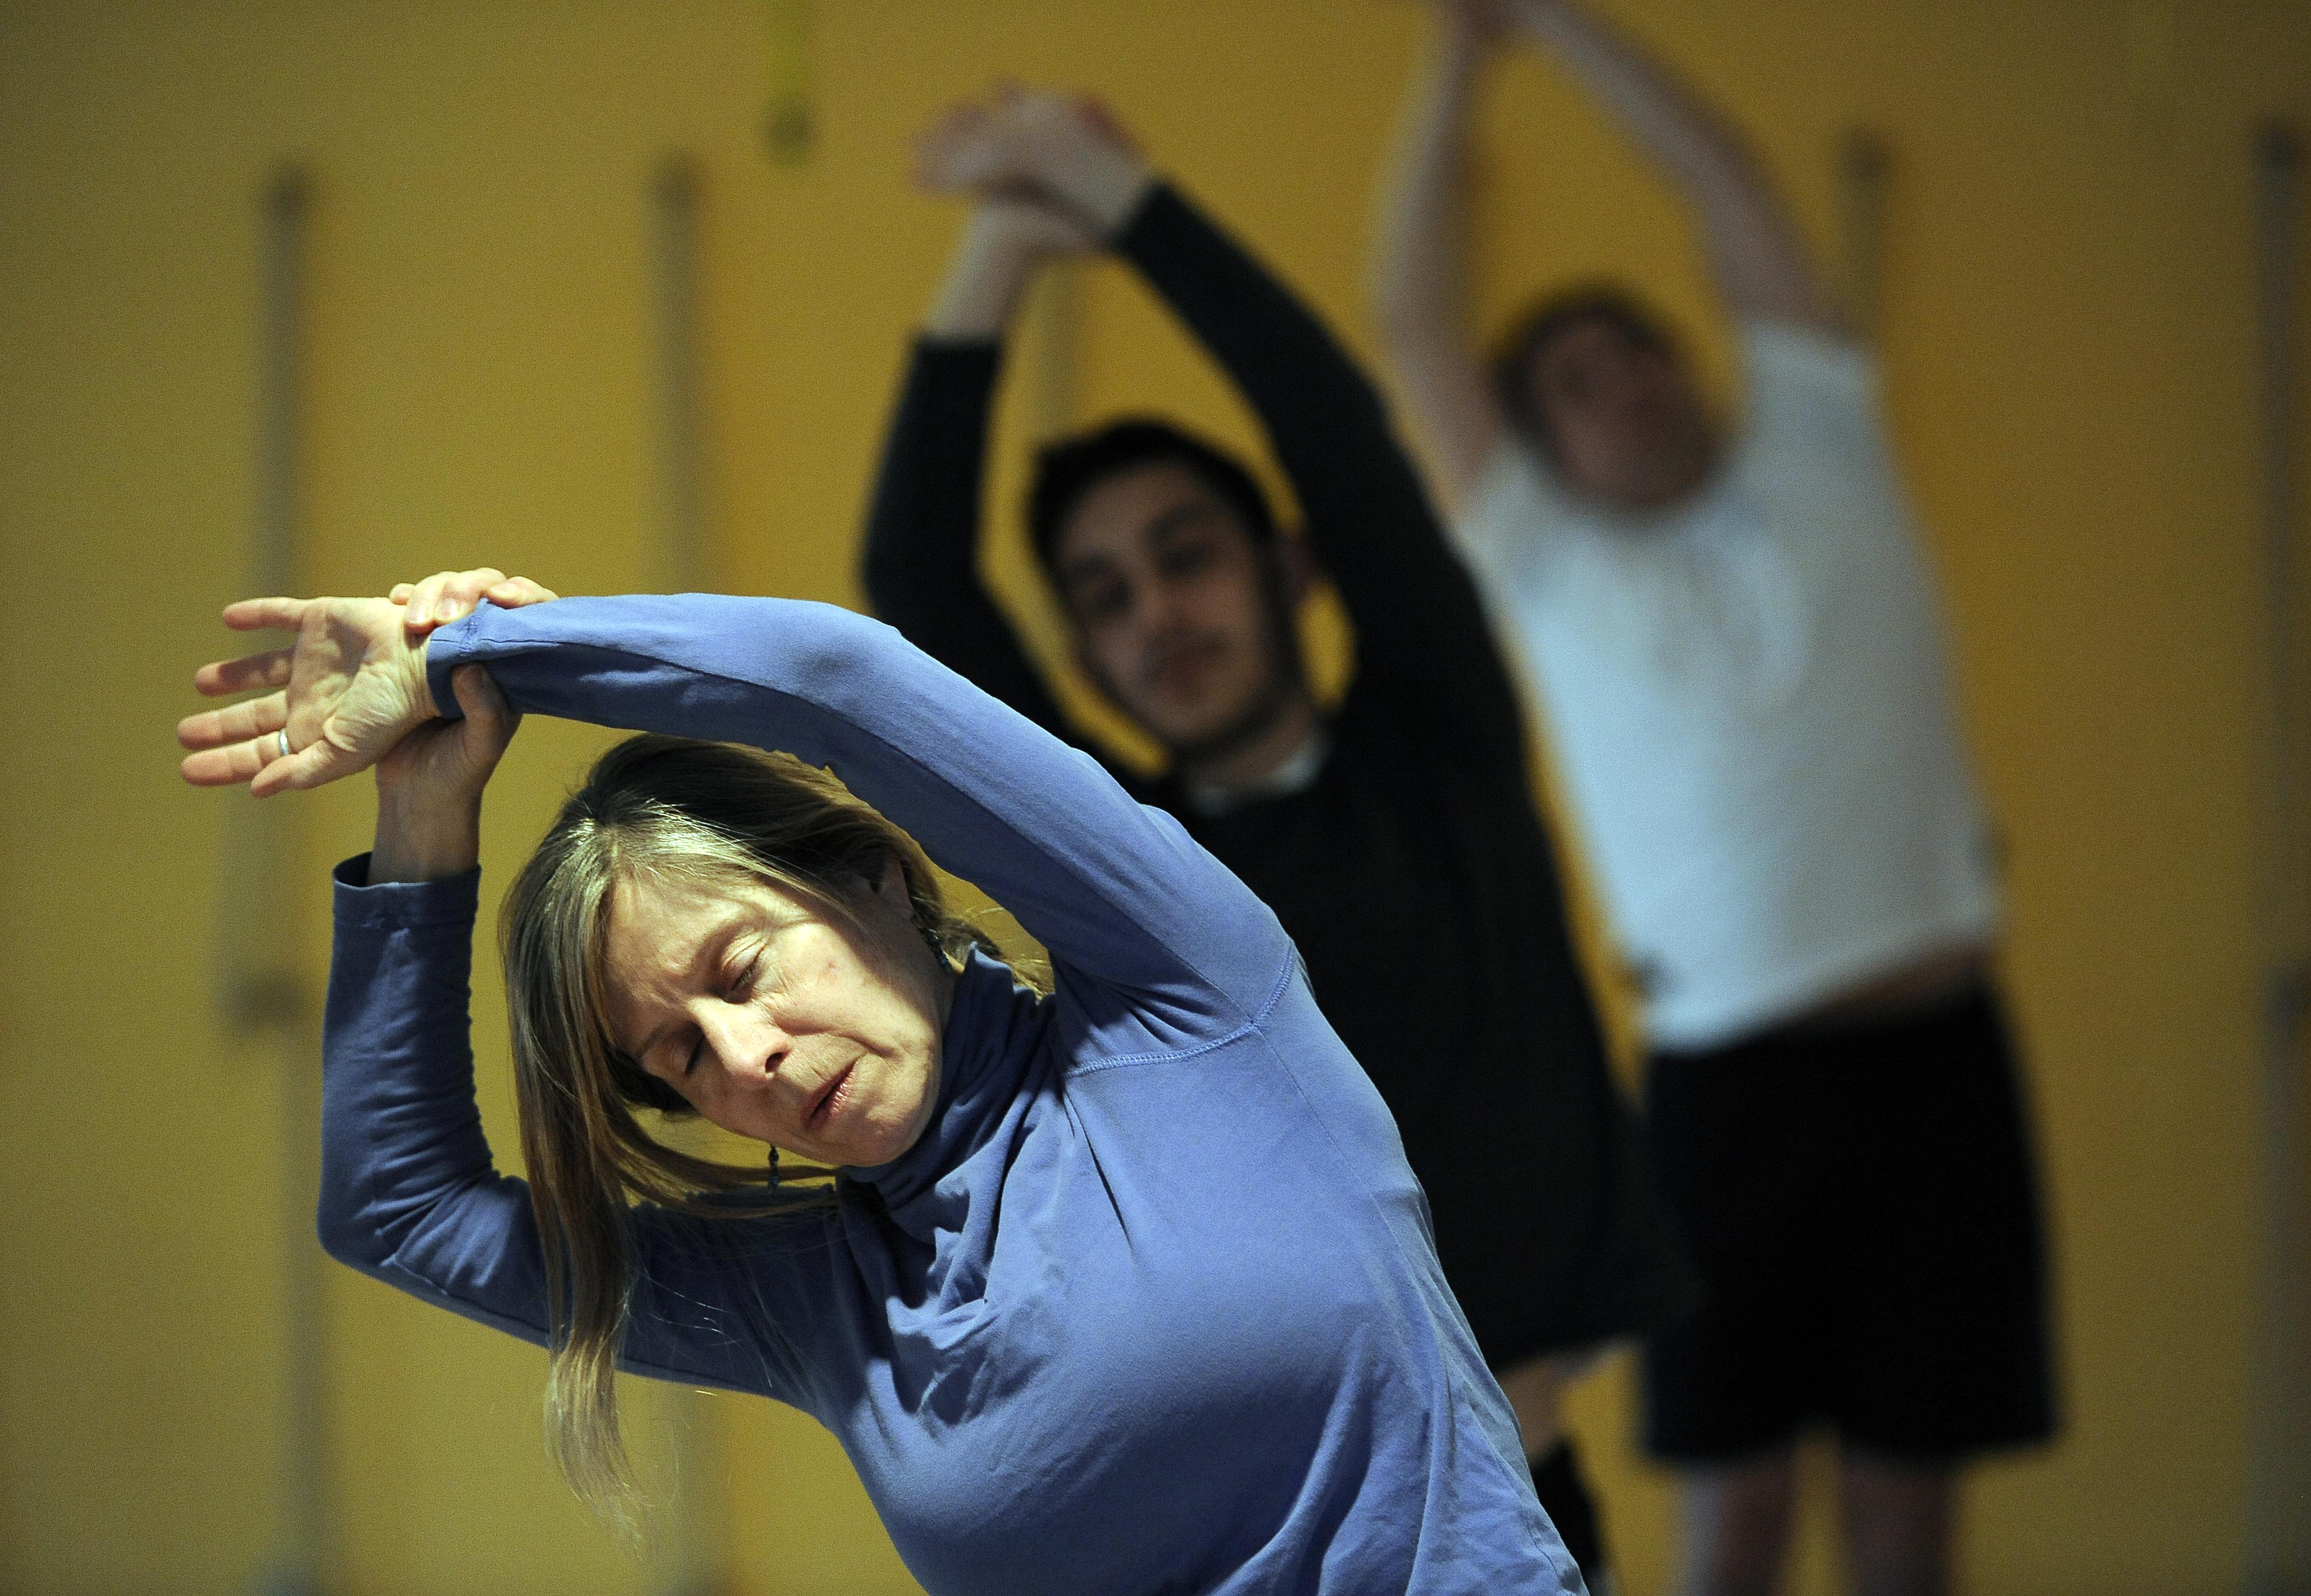 Tuesday night Adult Yoga class at the Ann Arbor YMCA, 3-4-14.